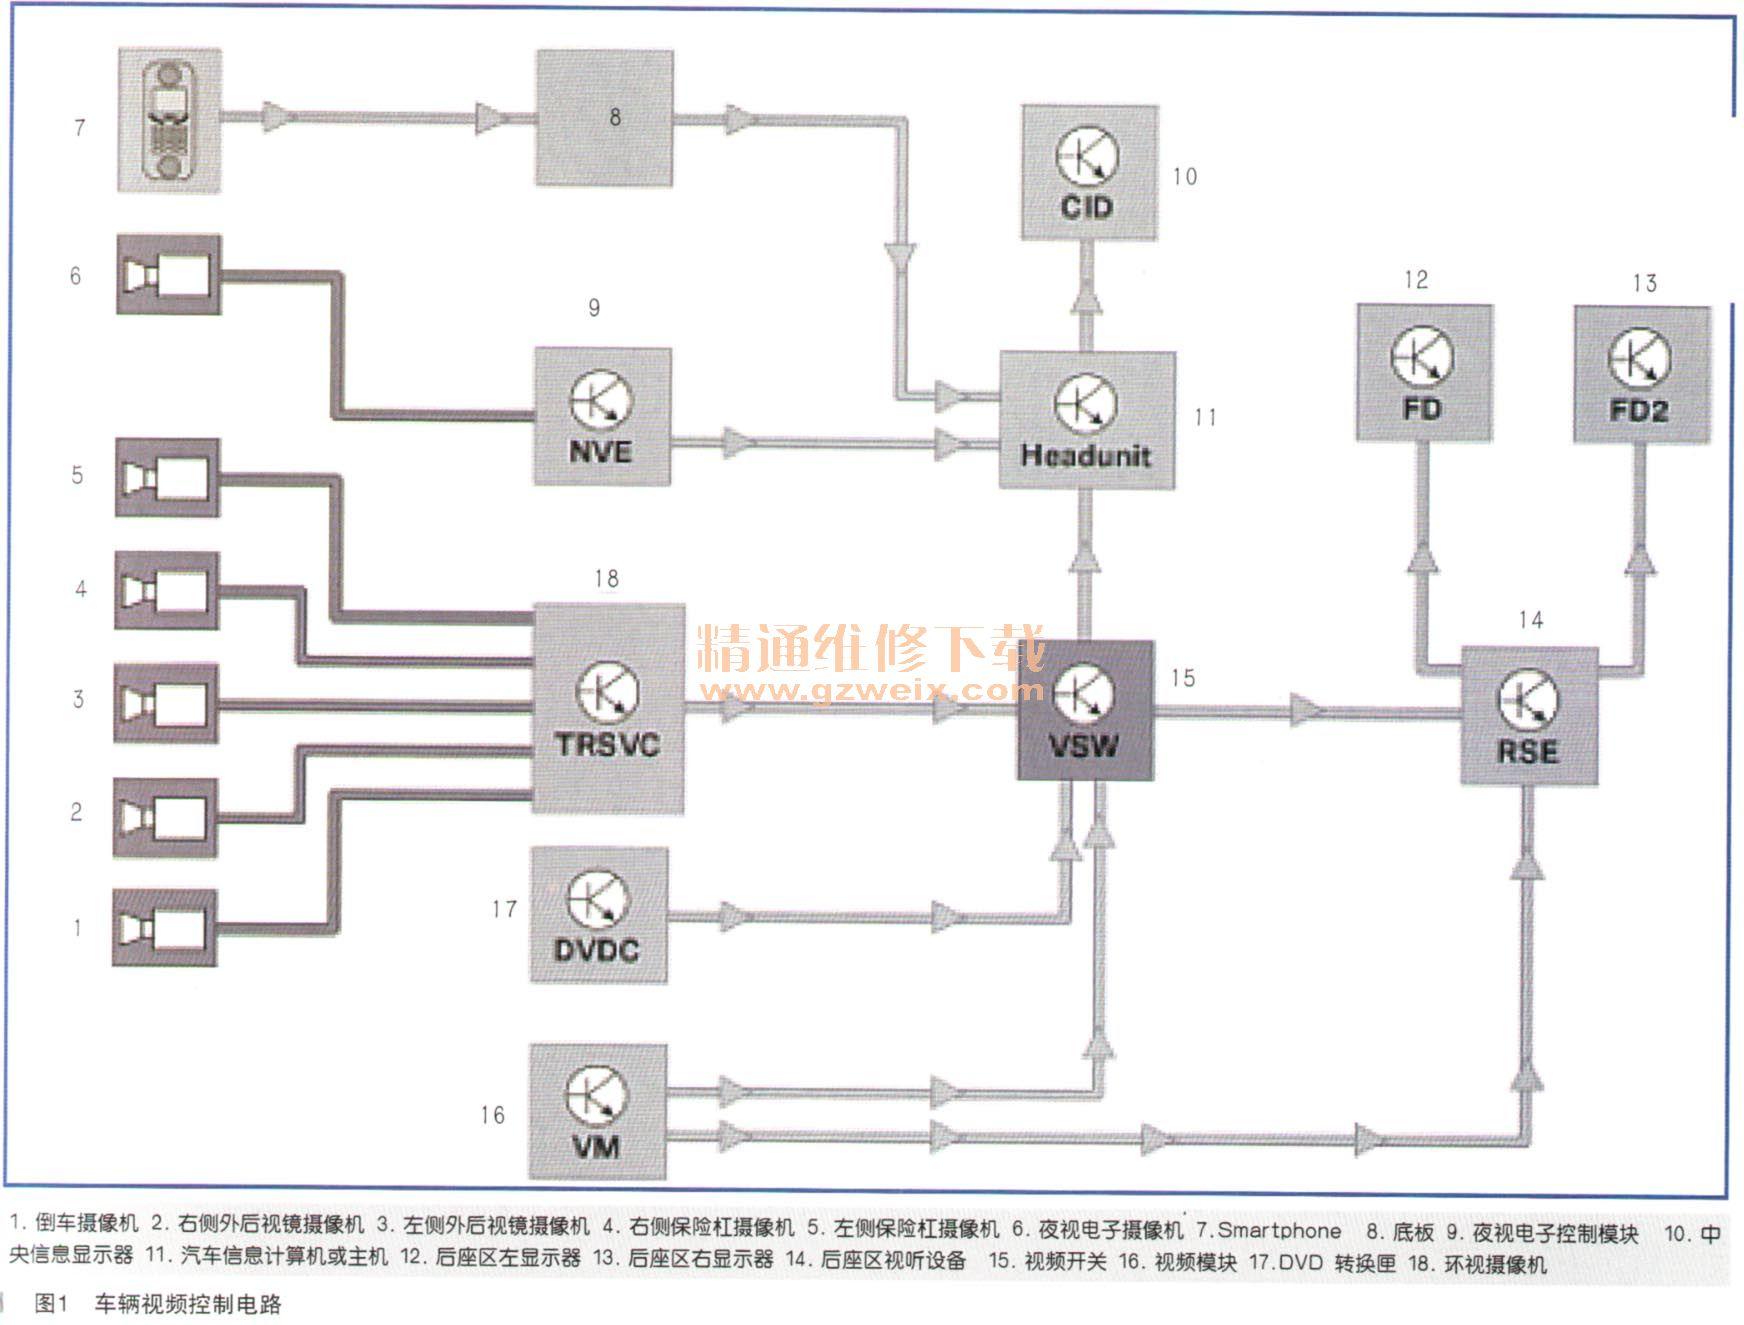 MOST系统分析结果,车辆任务与保存的MOST环形结构配置之间存在不一致。下列控制模块参与了: ·RSE-后座区高级视听设备 ·DVDC DVI)交换机 ·A1ViPT顶级高保真系统放大器 ·VM视频模块 ·ULF-SBX-H高级装备接口盒 而没有正确存储的MOST环形结构配置,则不能对MOST环形结构的状态做出可靠的判断。继续进行分析,检查故障码存储器是否存储有'与MOST通信有关的故障。大多数涉及MOST环形结构通信的故